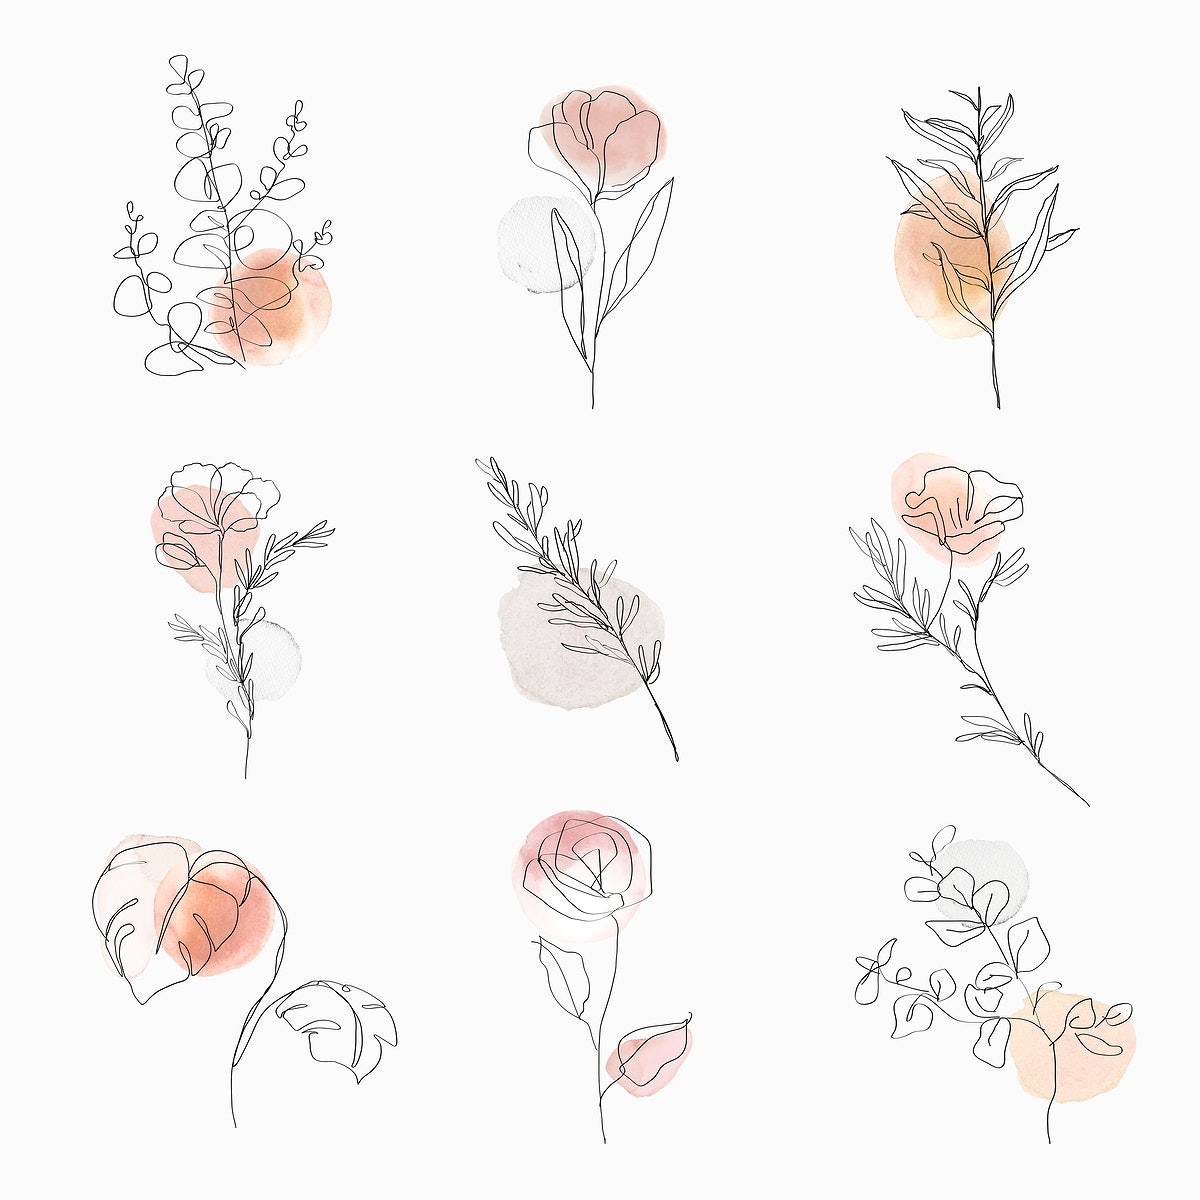 Flowers line art psd botanical watercolor minimal illustration set